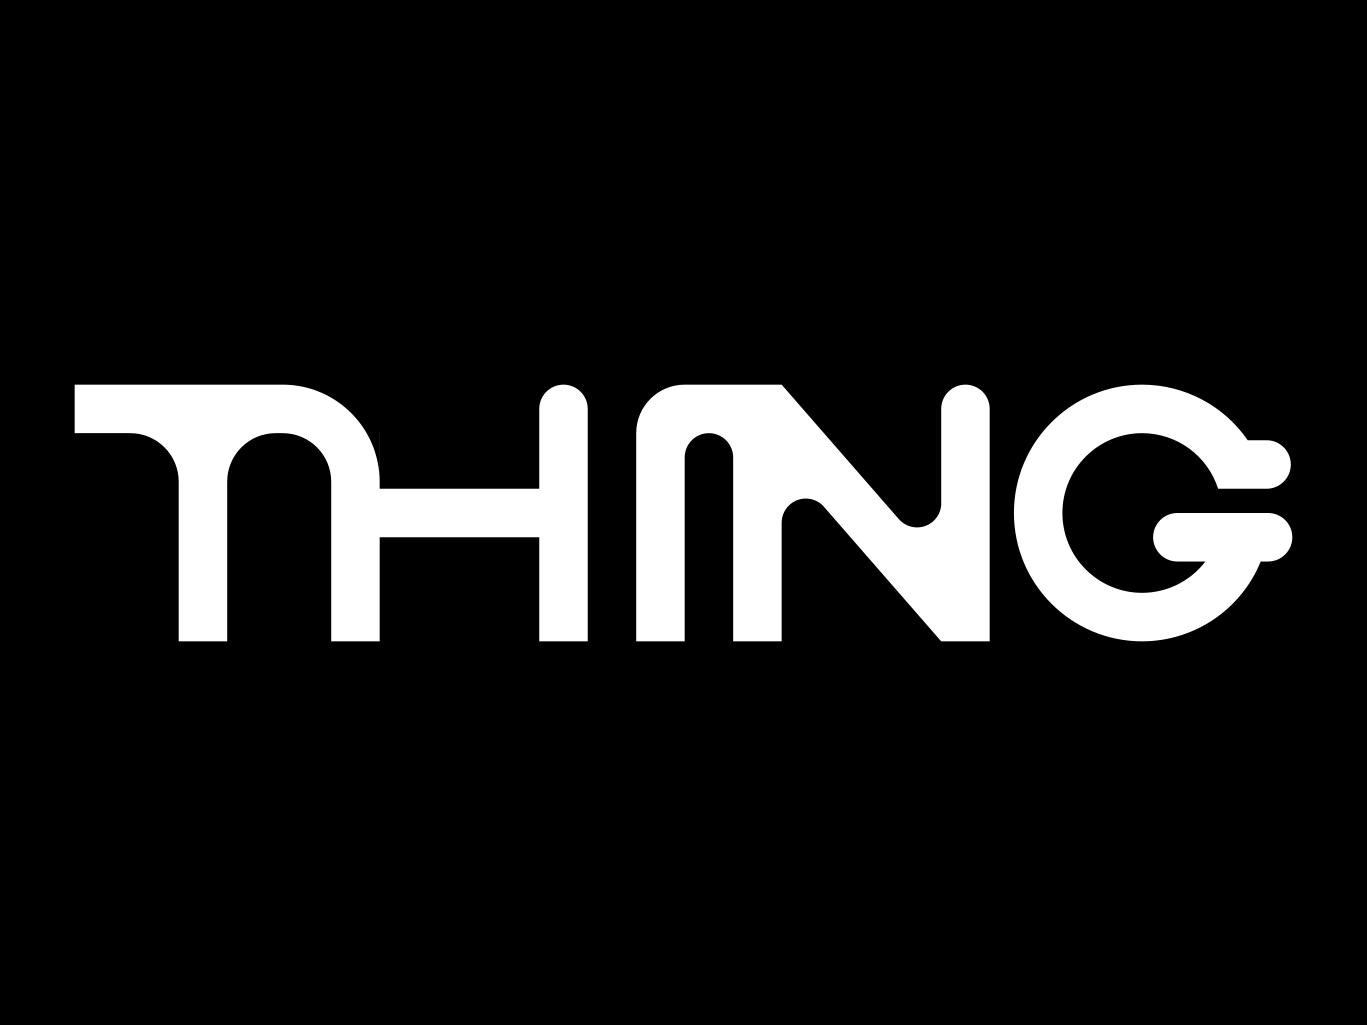 Thing Design word vector design logo digital